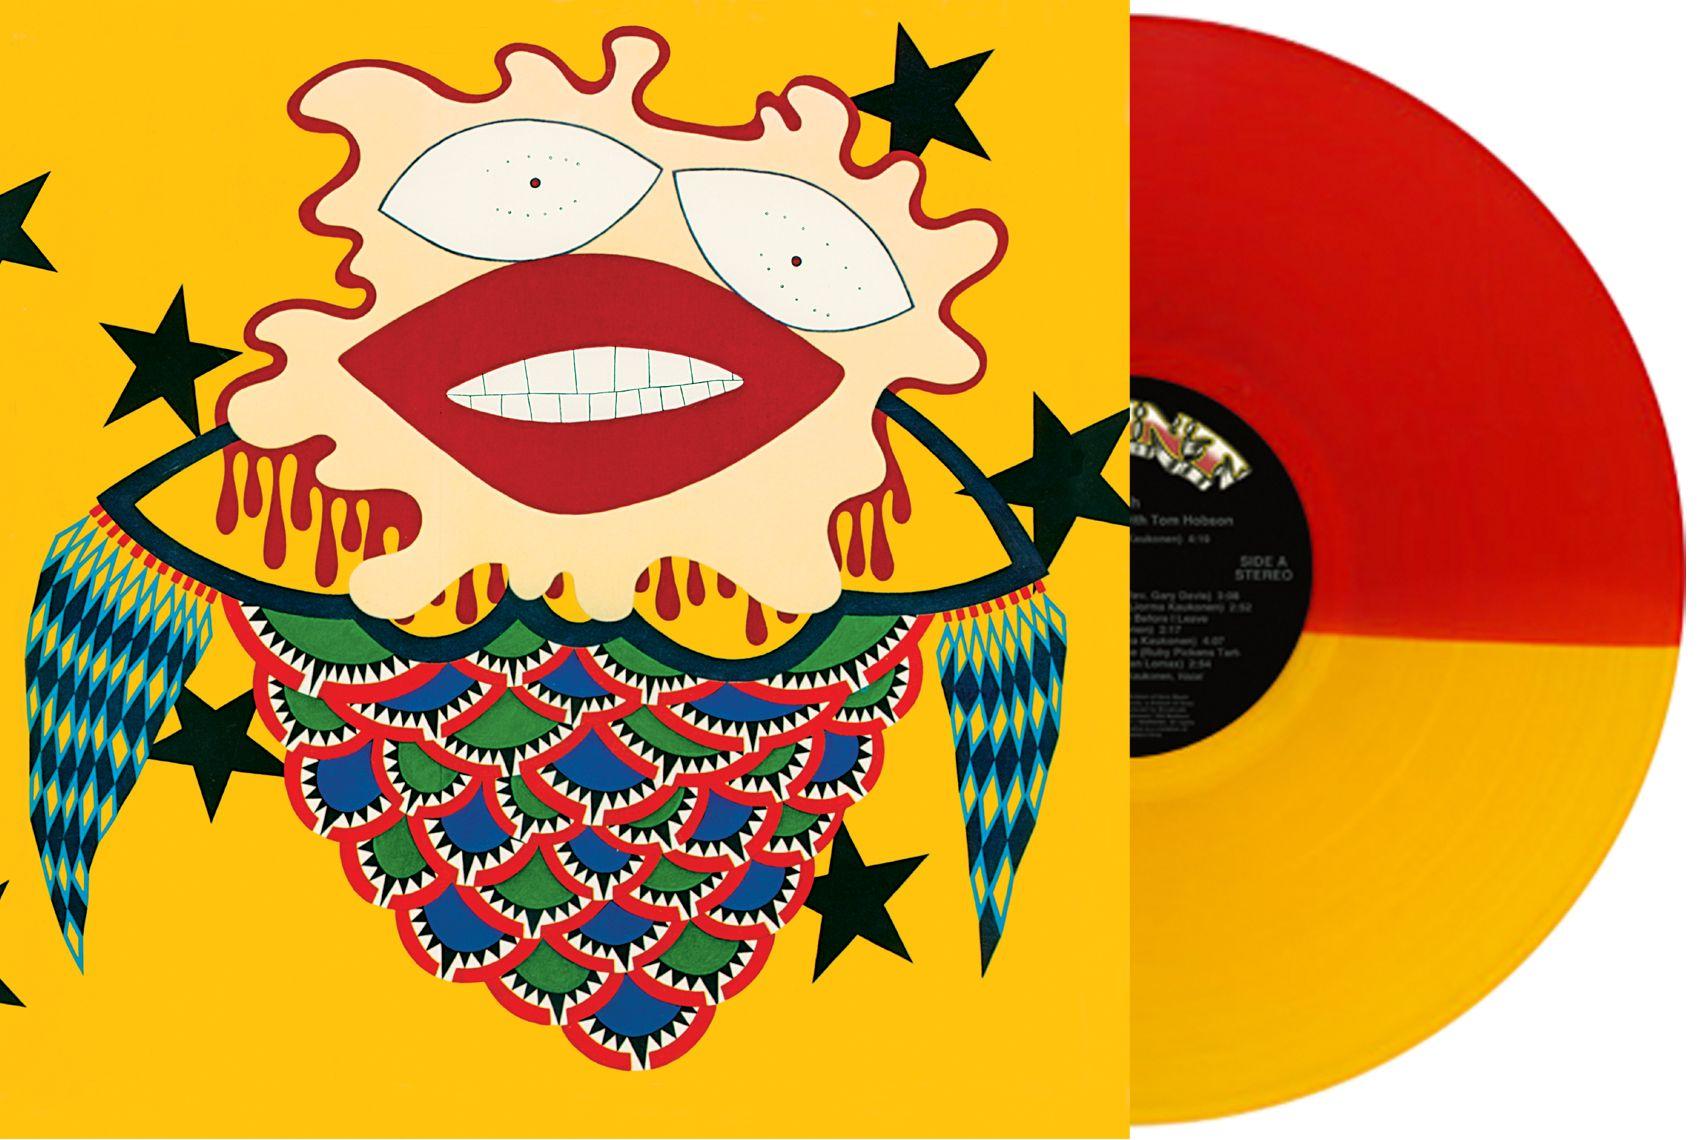 Jorma Kaukonen Quah Vinyl Hippie Shop Record Store